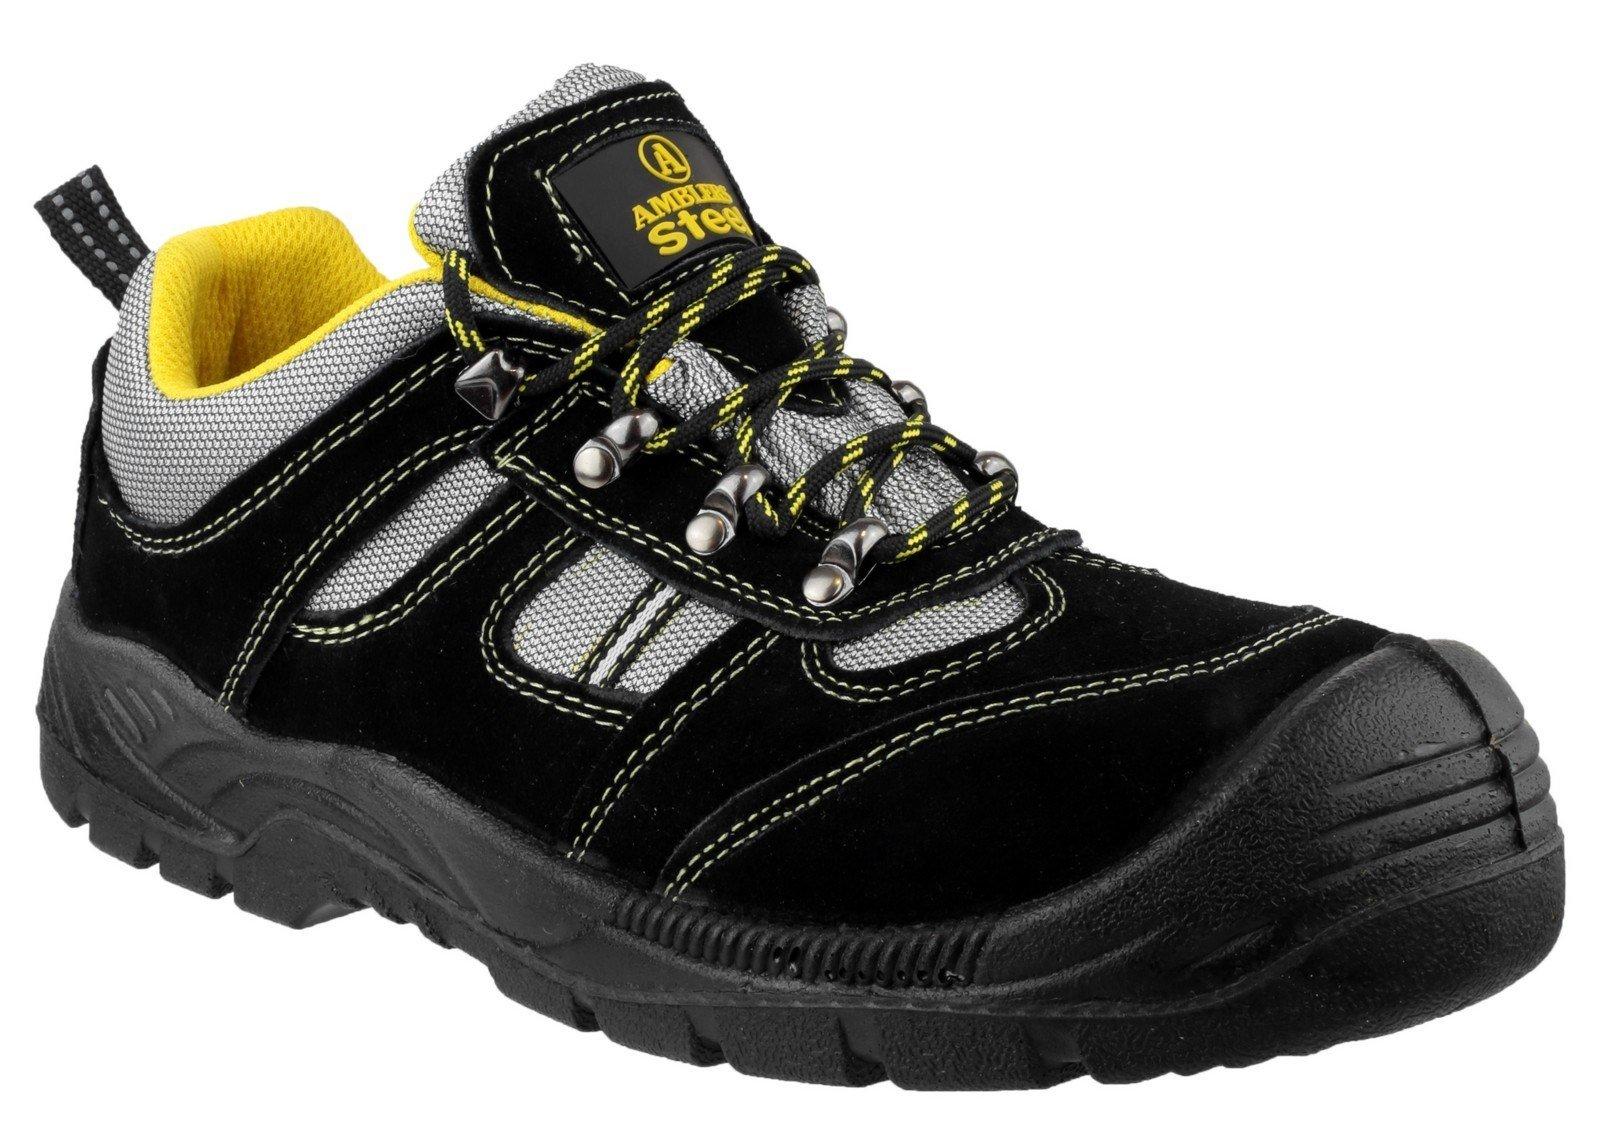 Amblers Unisex Safety Lightweight Lace up Trainer Black - Black 3